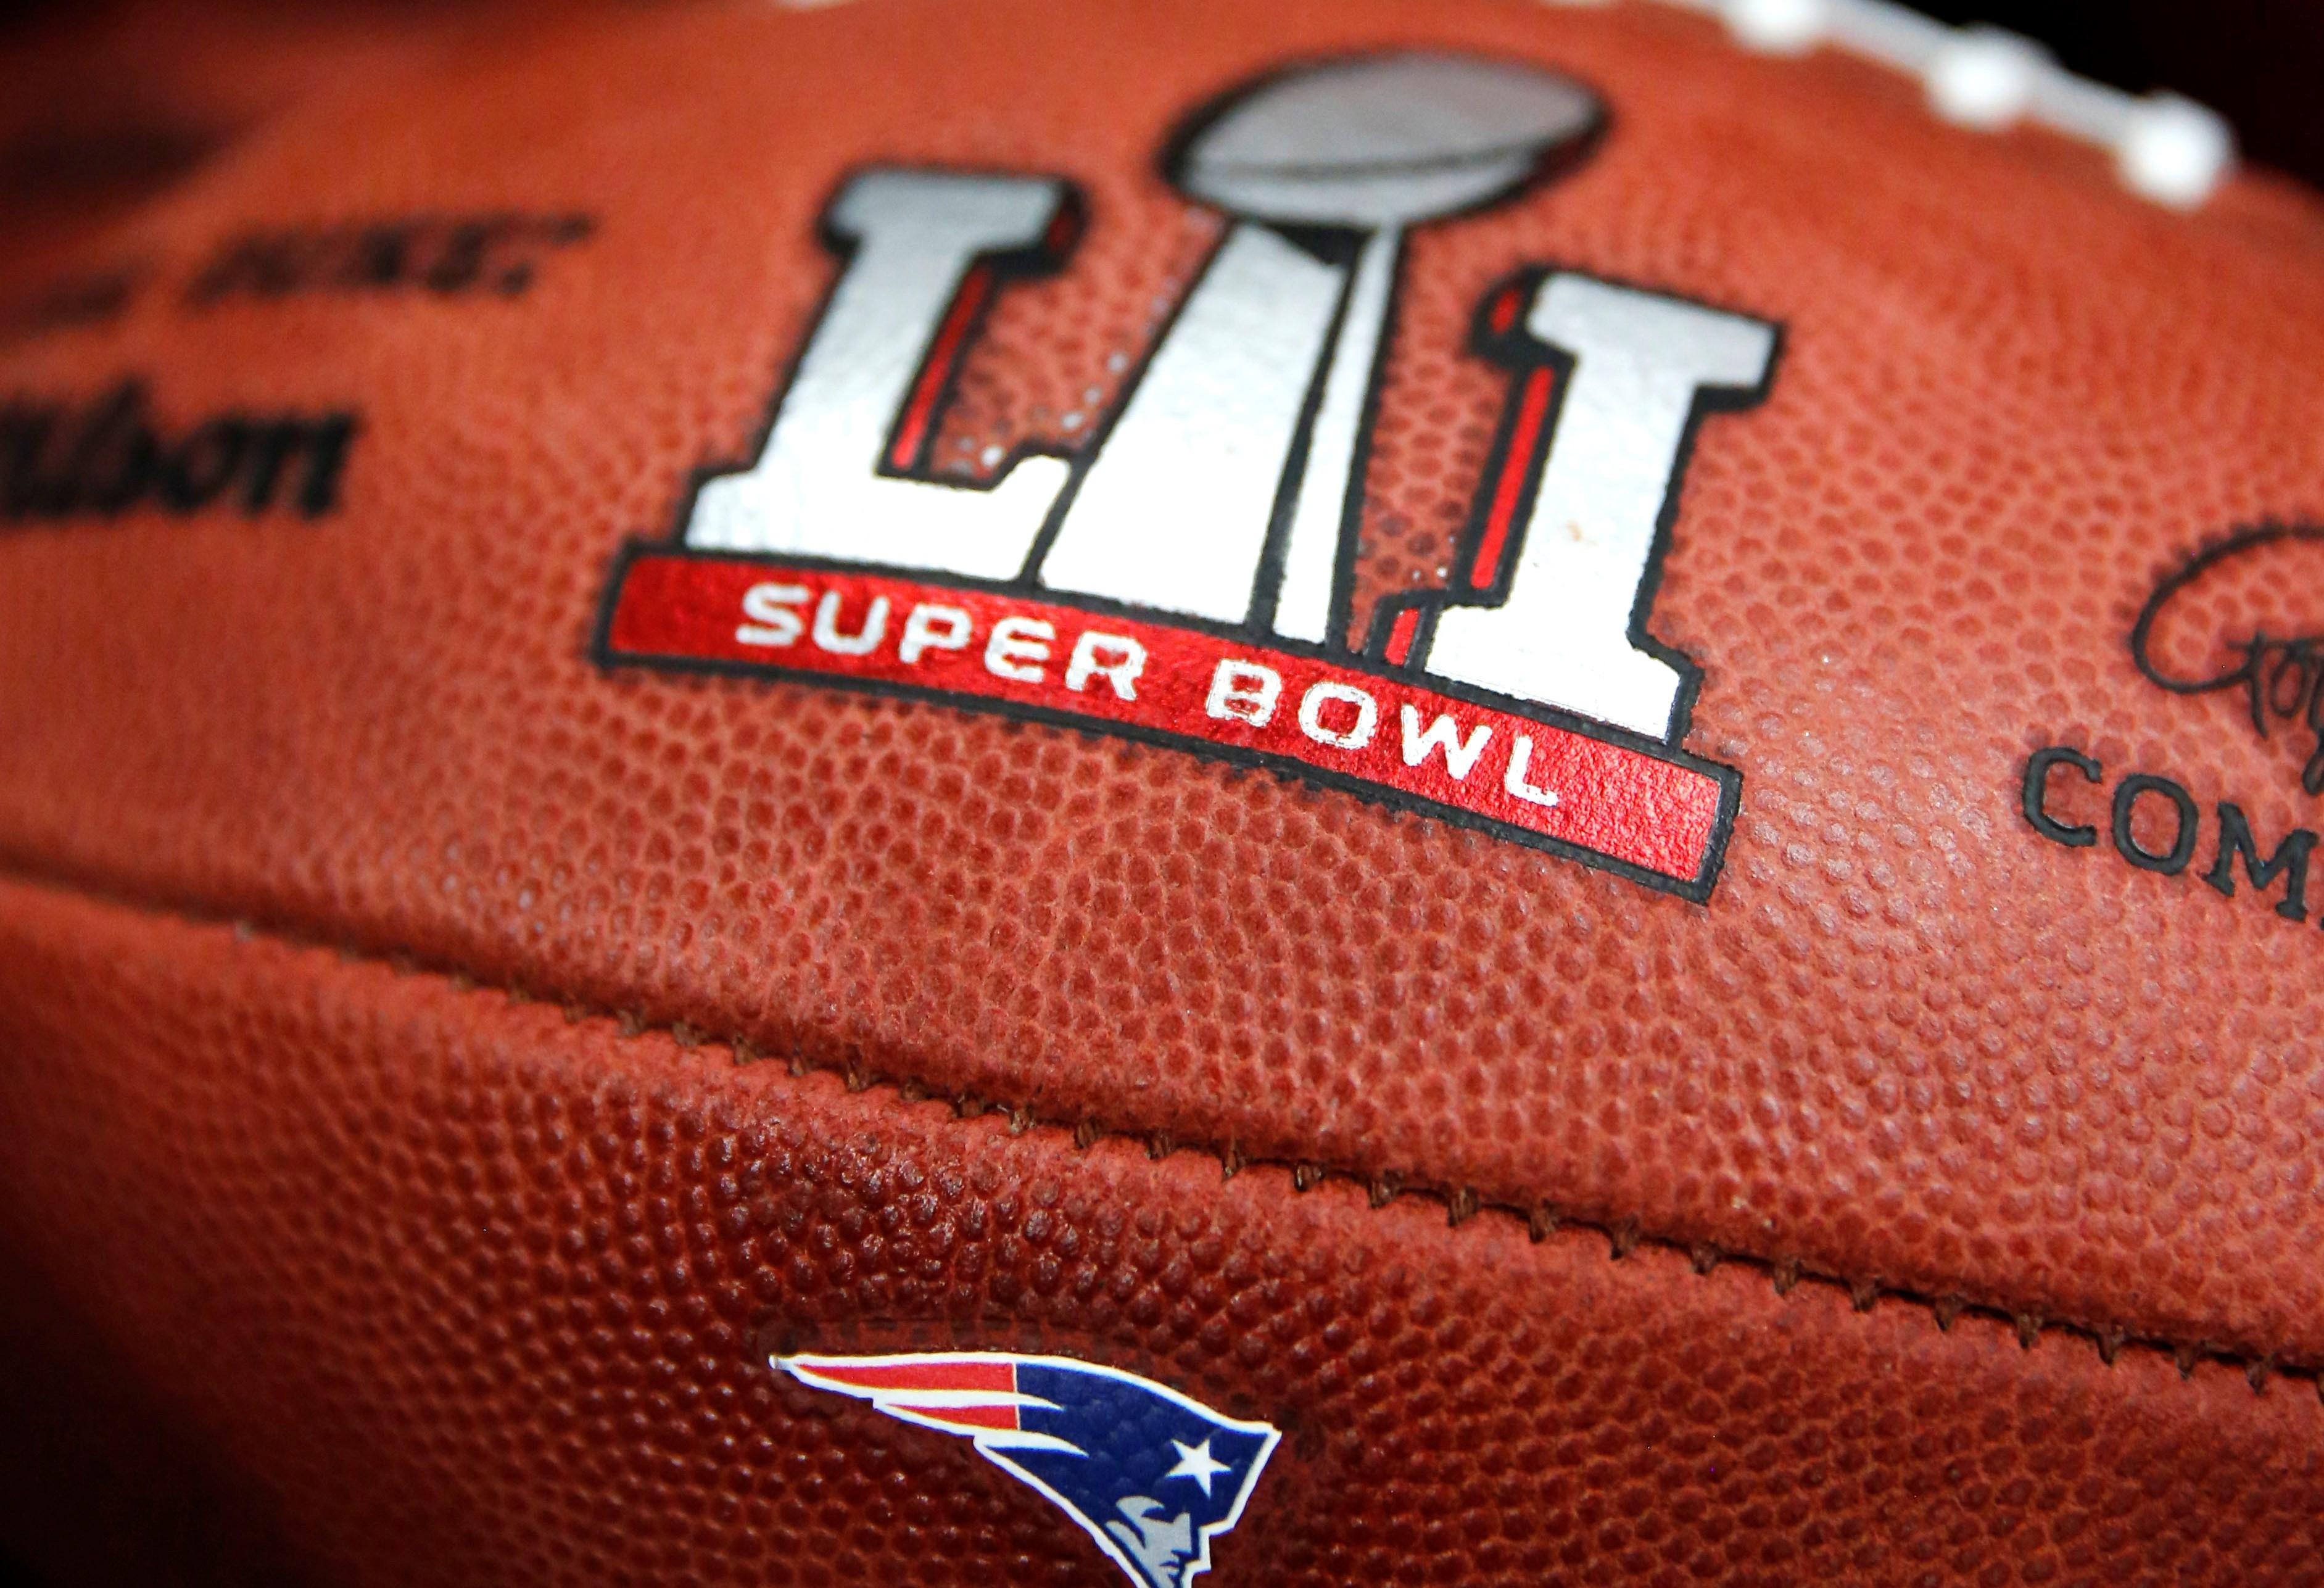 Super Bowl Li Game Notes: New England Patriots Vs. Atlanta regarding Nbc Super Bowl Mvp Vote